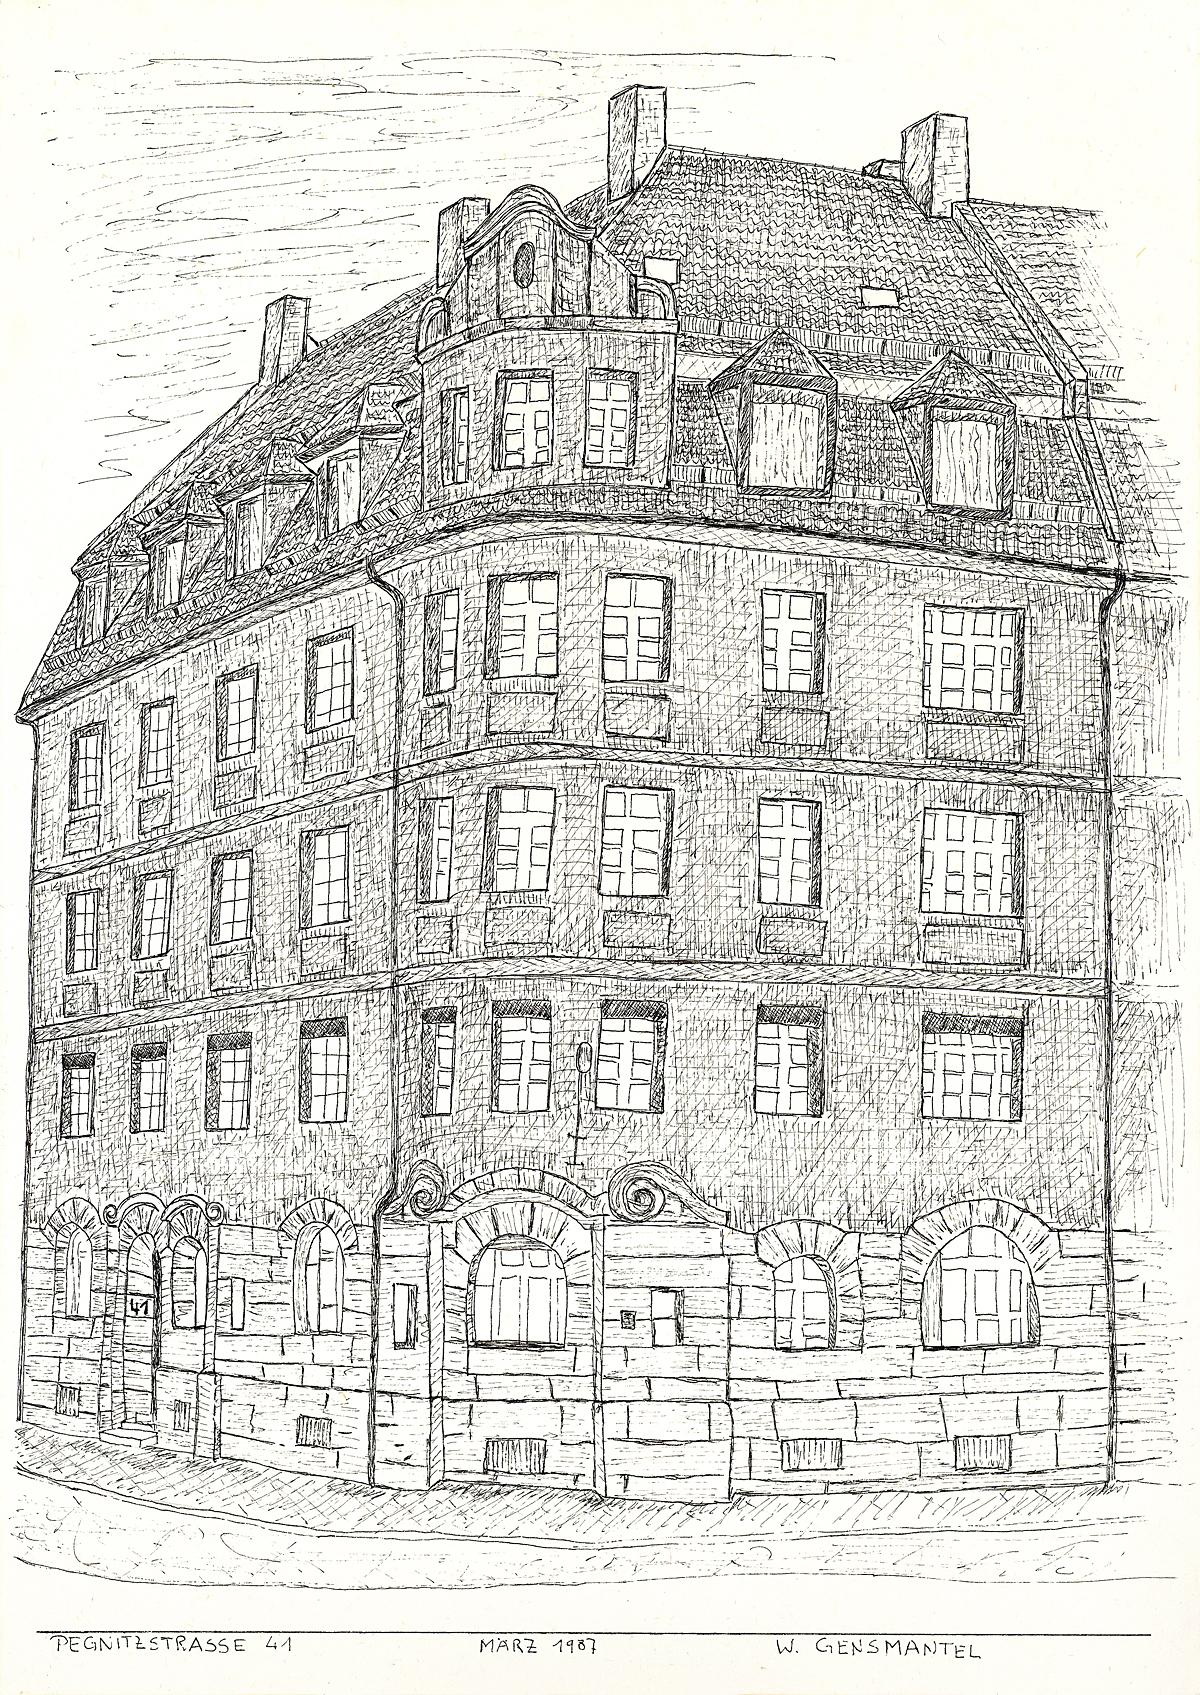 Fürth, Pegnitzstraße 41 (1987)